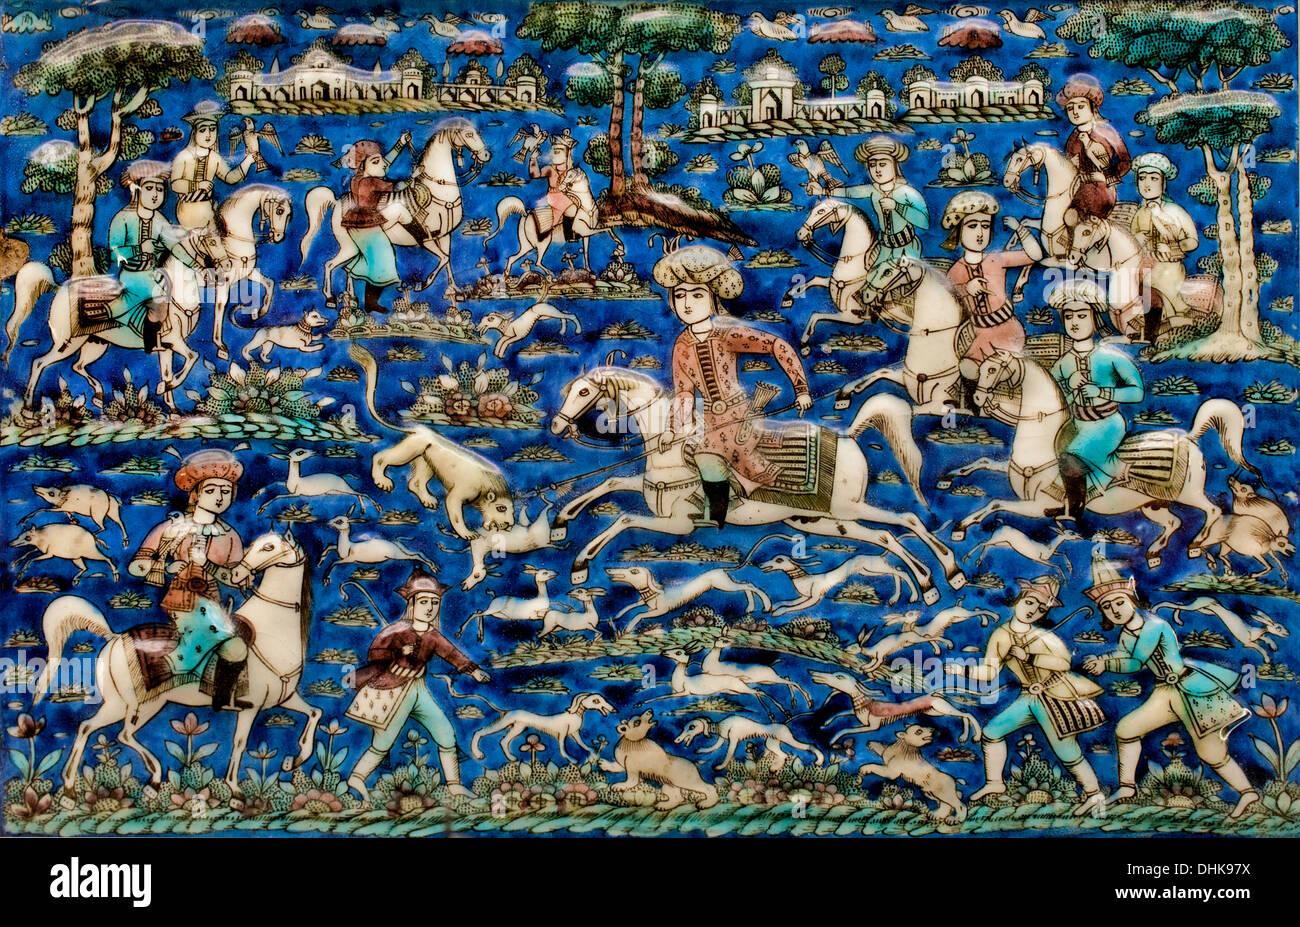 Wandplatte aus einer Jagdszene 18. / 19. Jahrhundert Teheran - Teheran Iran Kadscharen Persien persische Stockbild